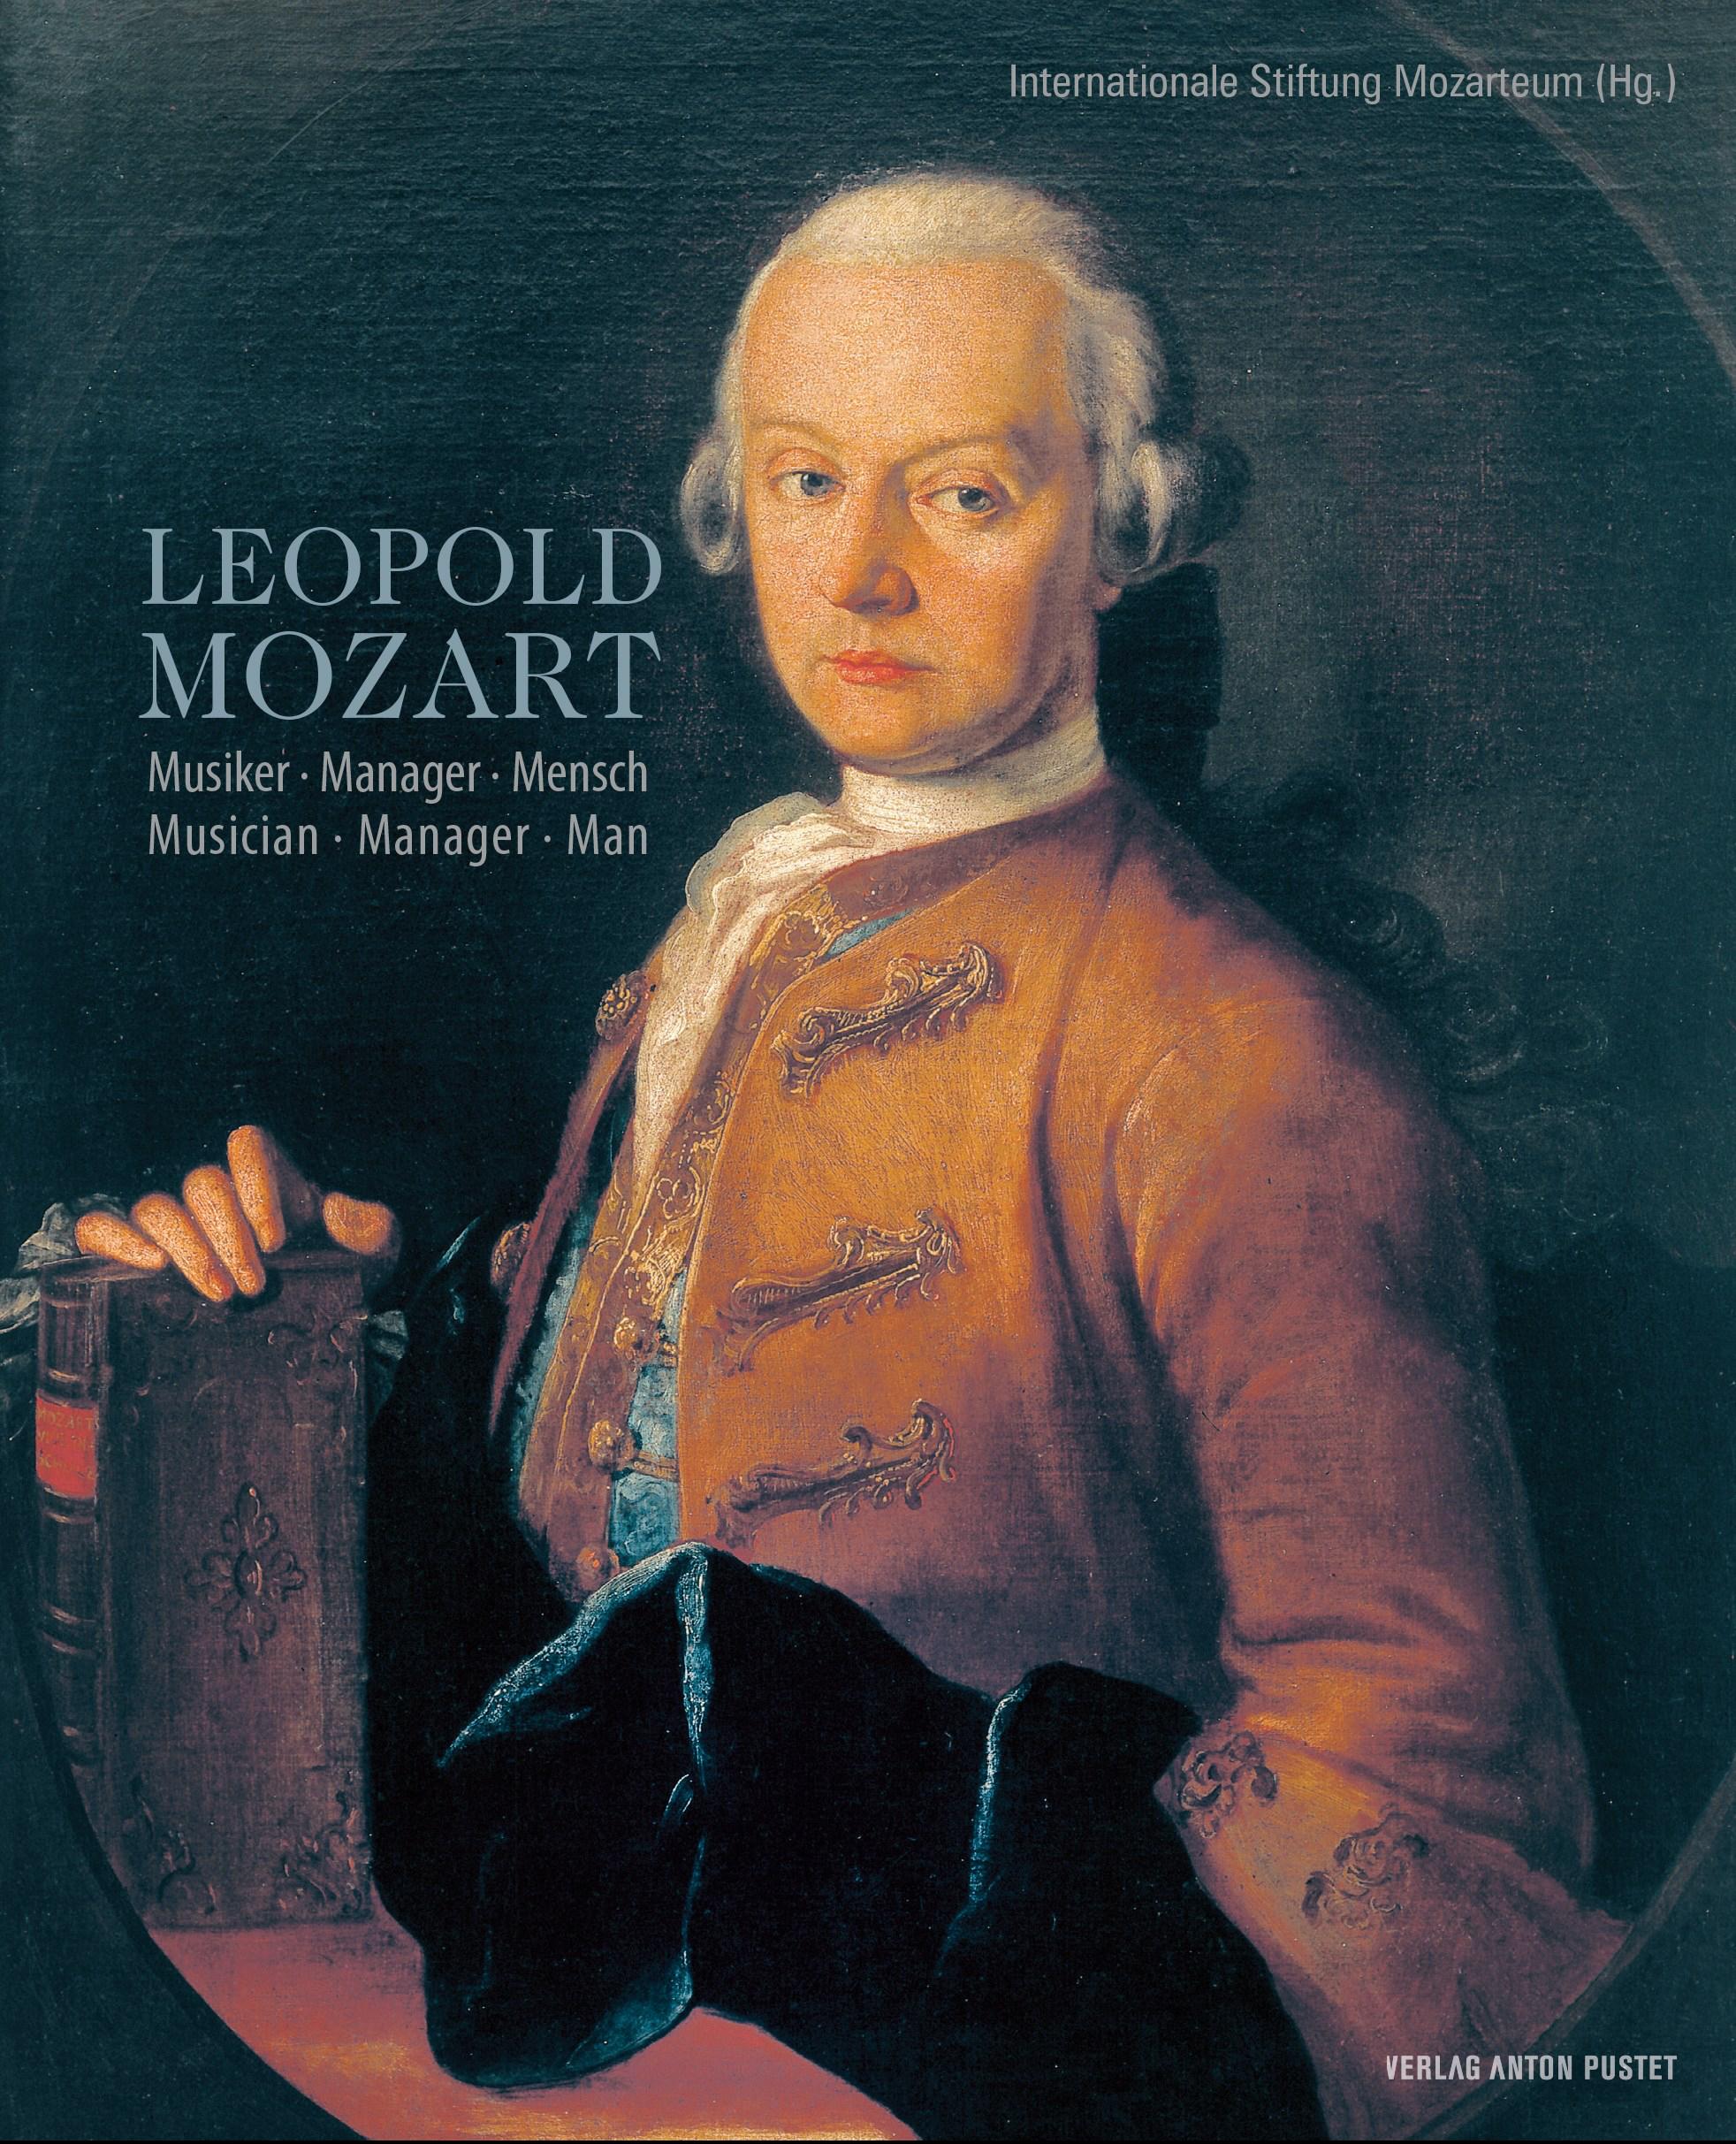 LeopoldMozart_Cover.indd